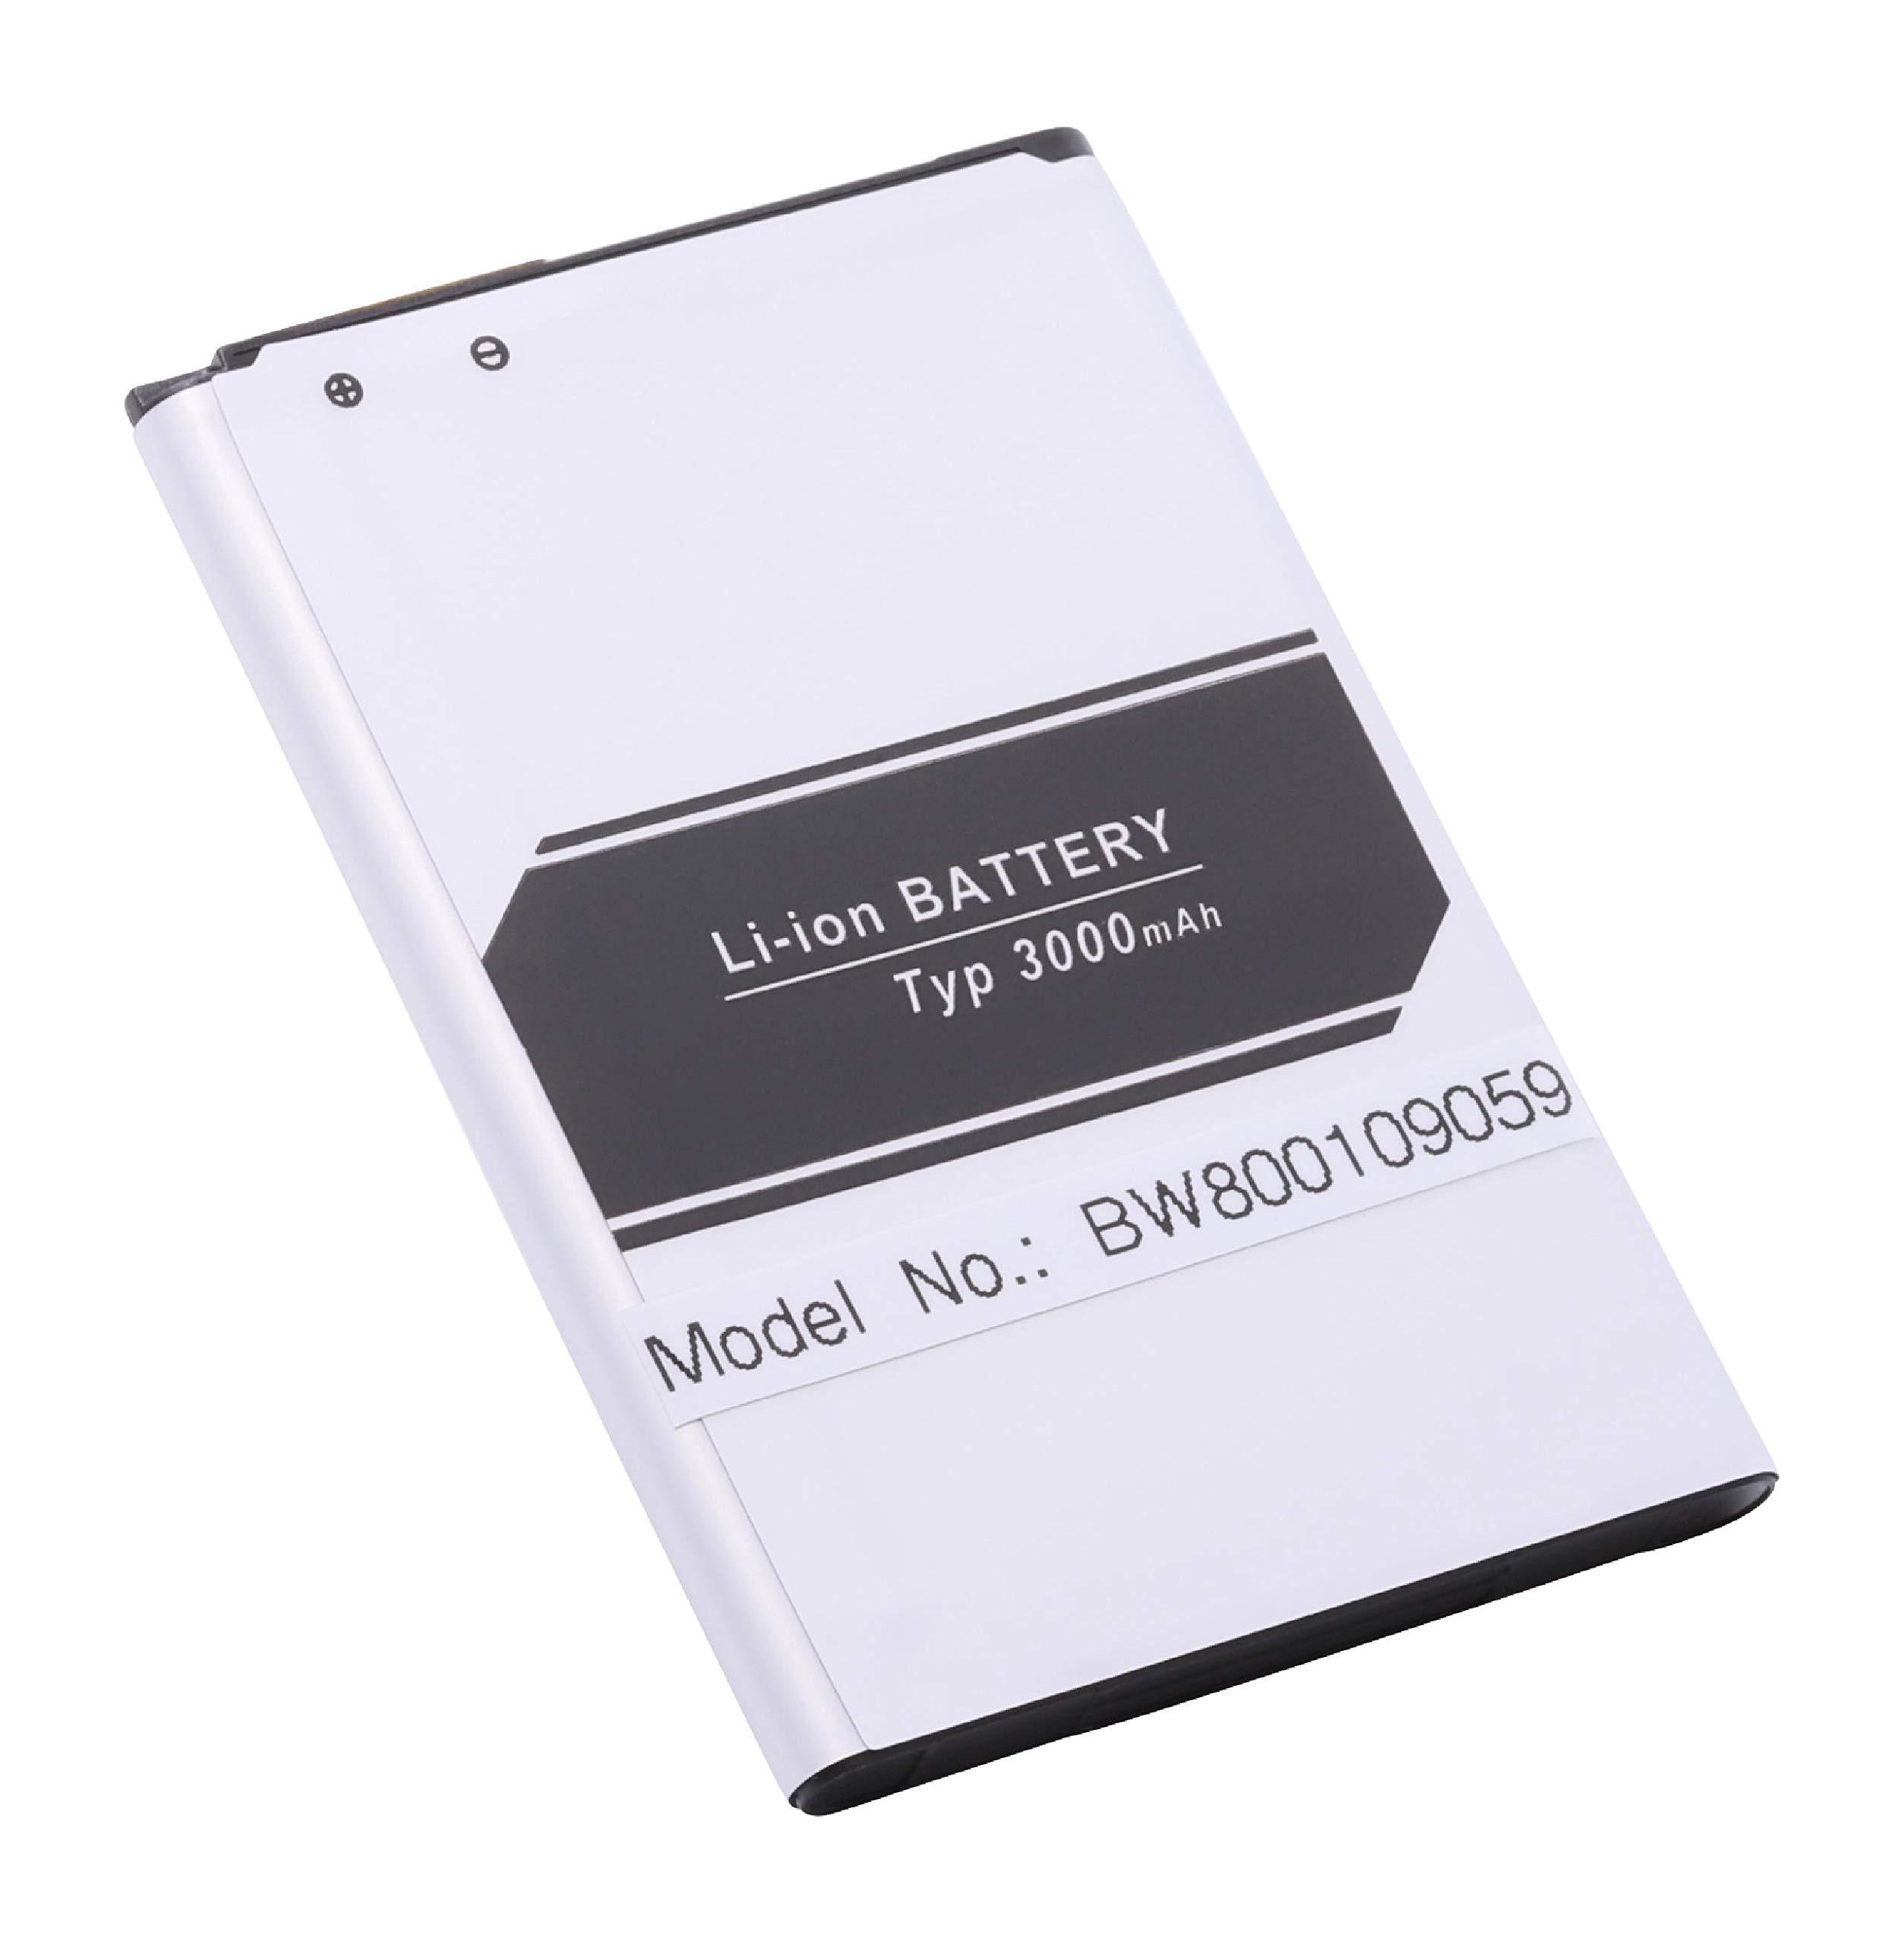 vhbw Li-Ion batería de 3000mAh (3.85V) para teléfono móvil Smartphone LG H540, H540T, G Stylus HDTV Dual SIM, G4 Stylus, P1s y BL-51YF, EAC62858501.: Amazon.es: Electrónica